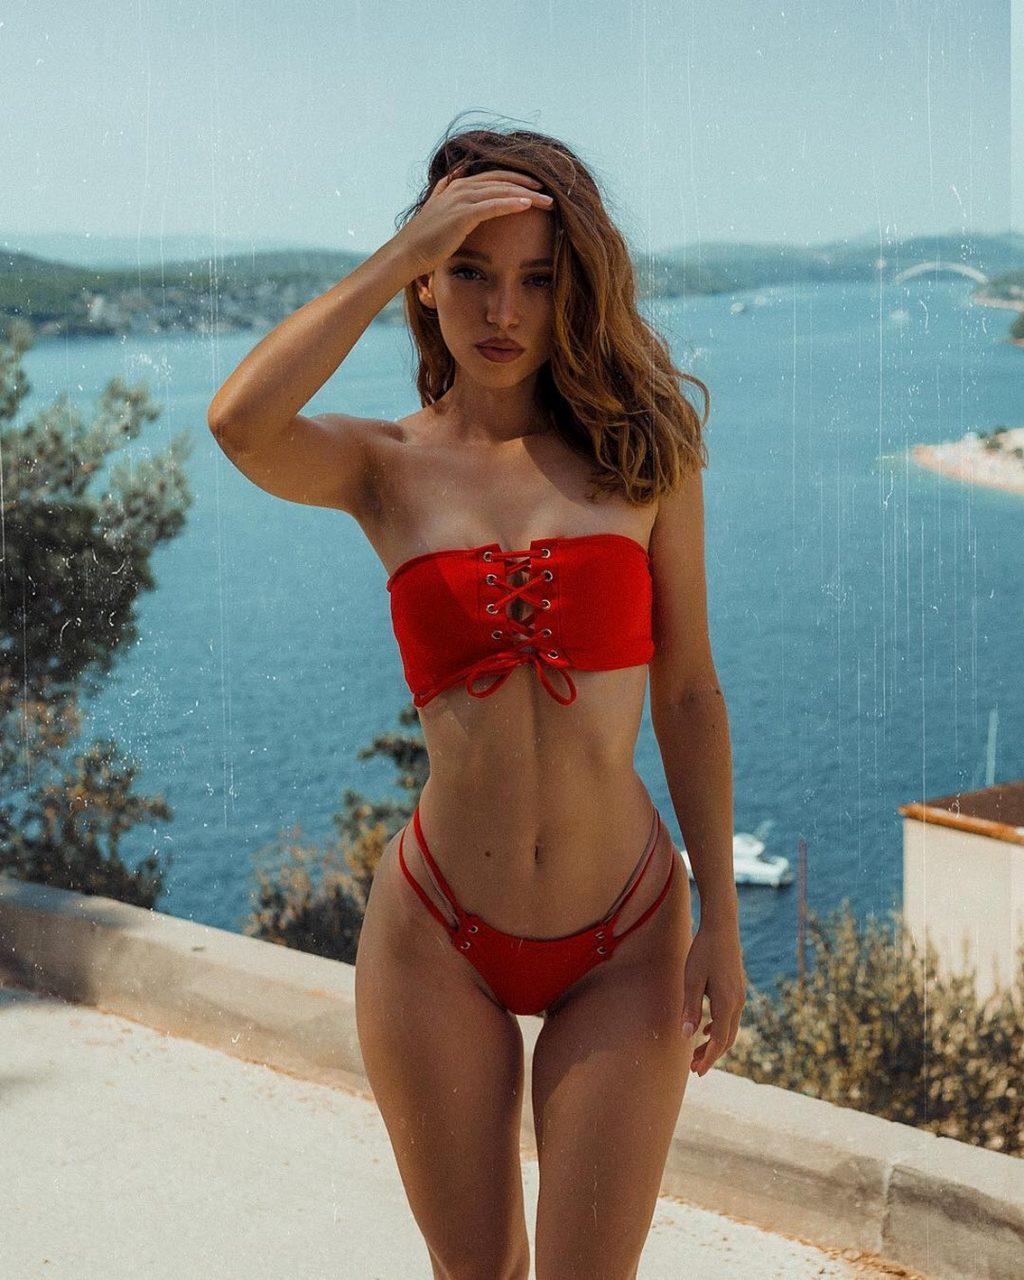 Miss Bo (Božana Abrlić) Sexy & Topless Collection (72 Photos + Video)